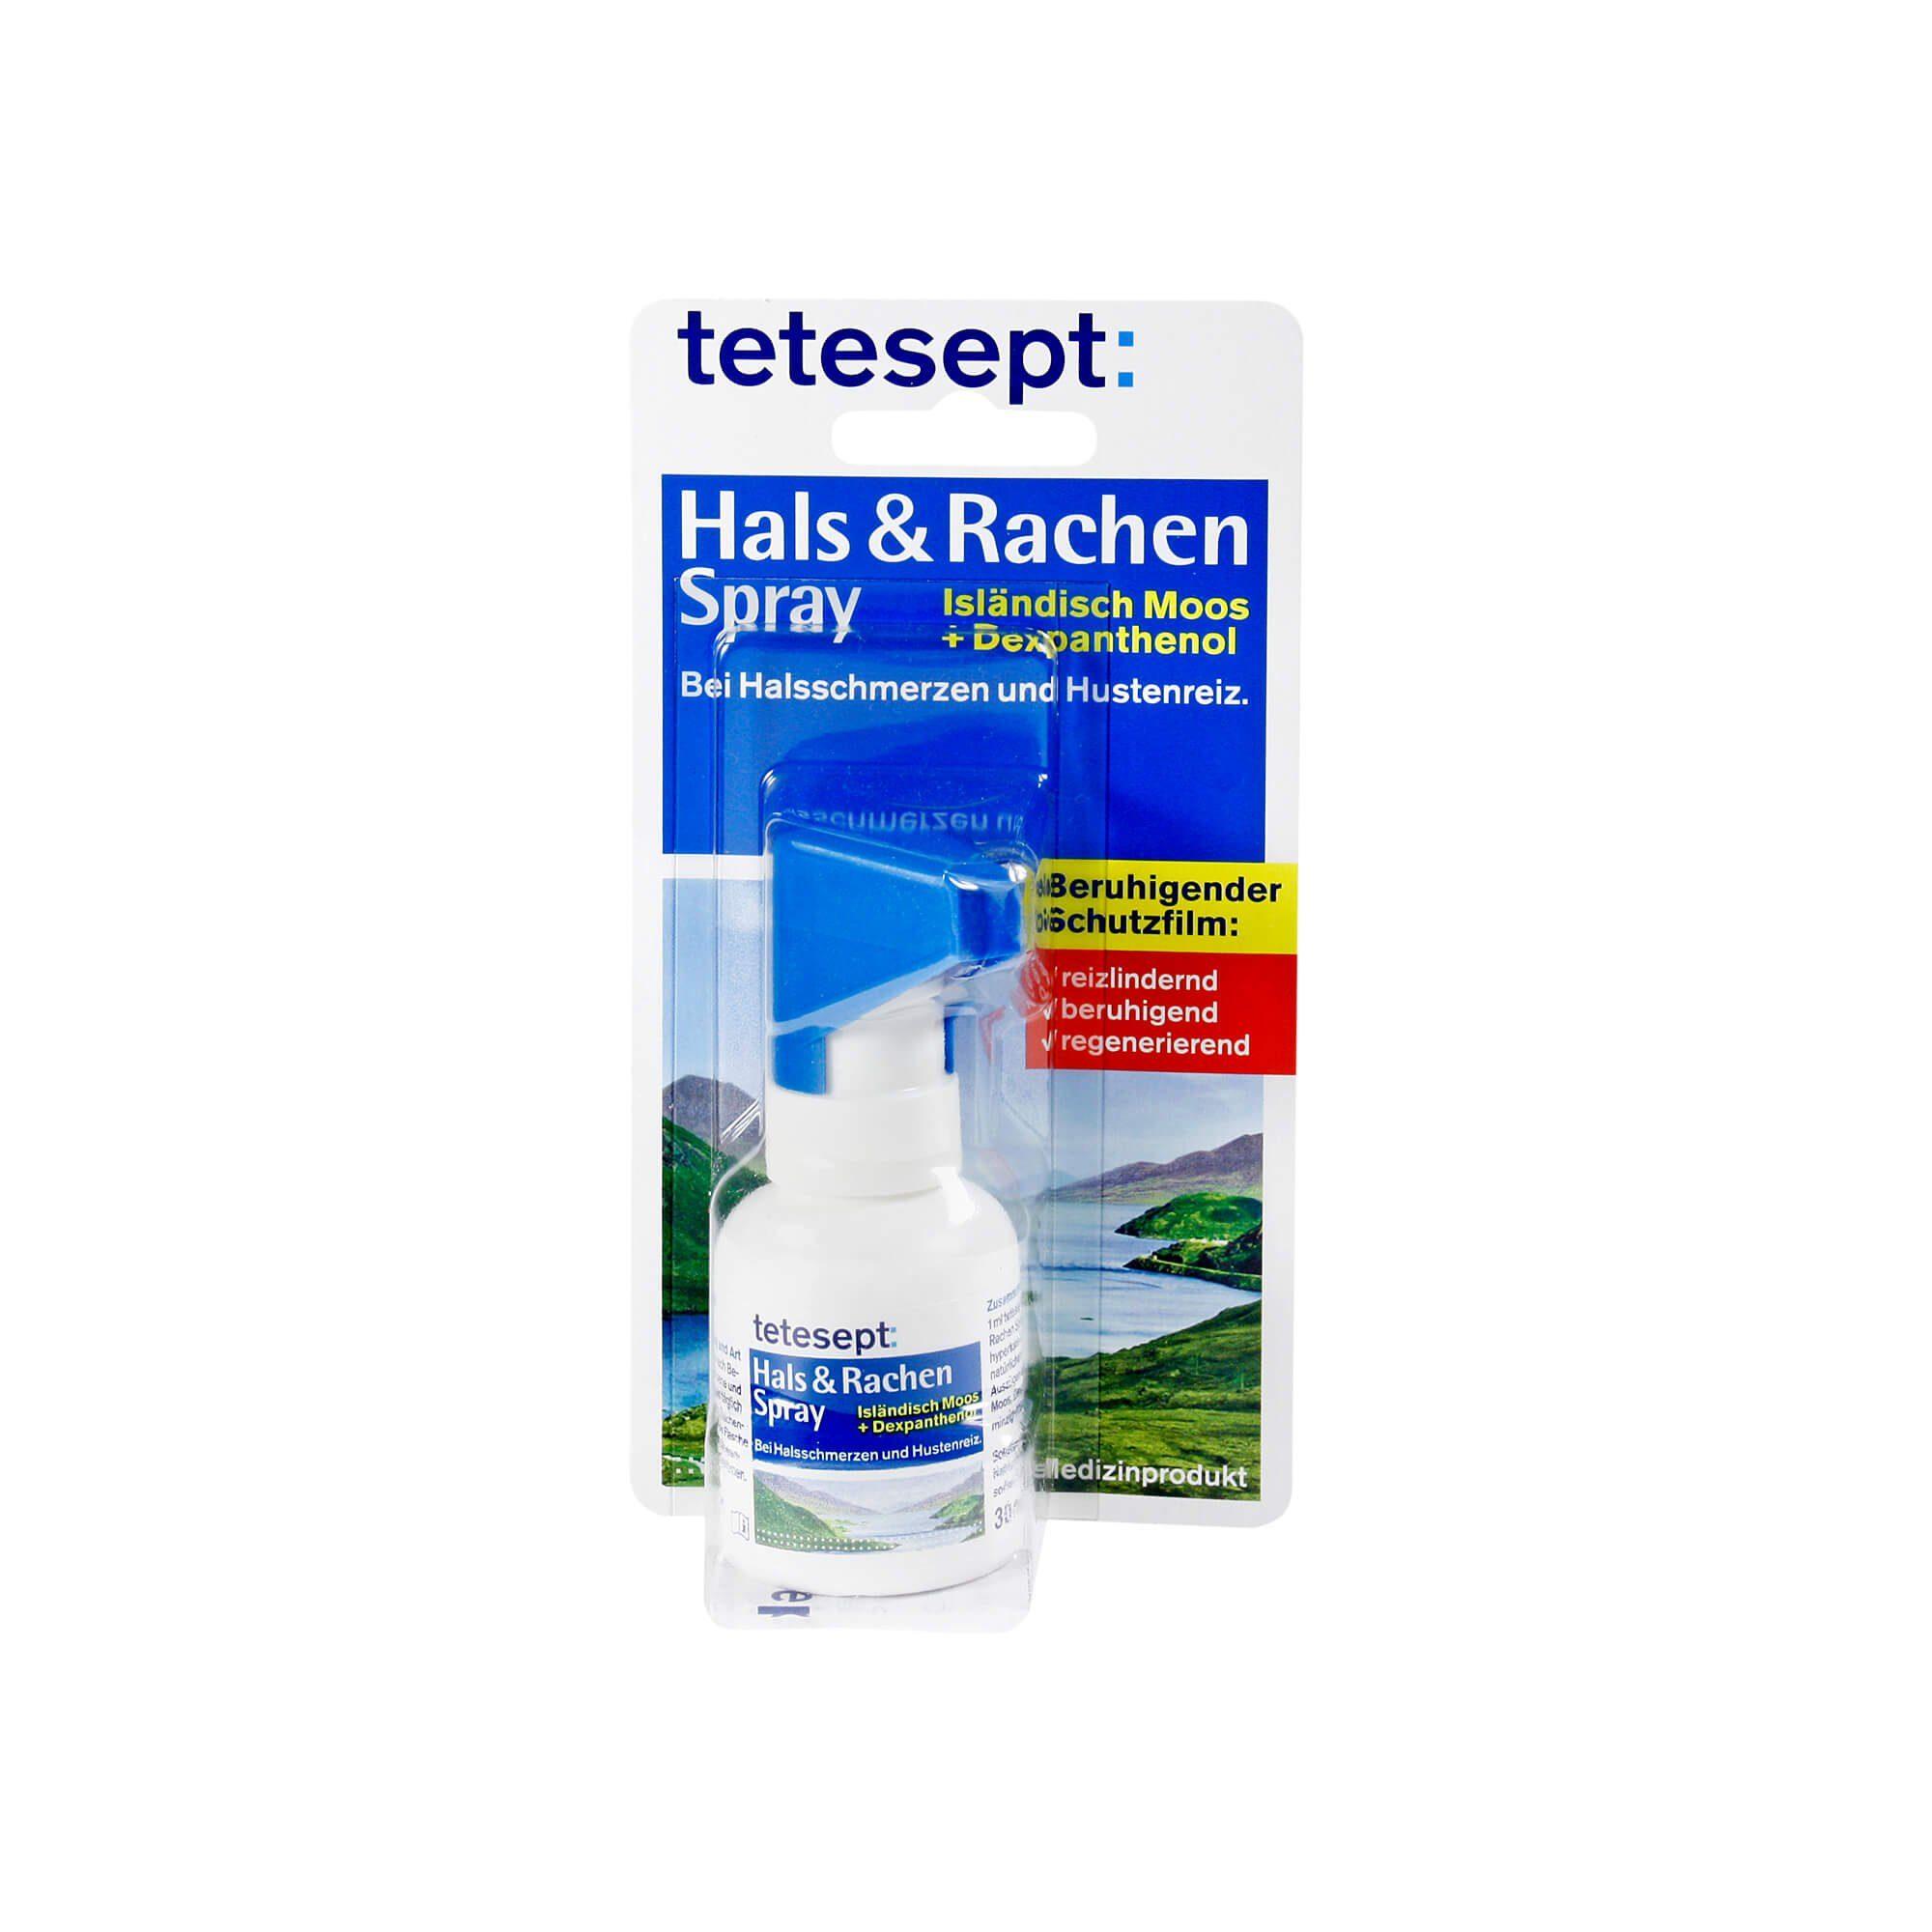 Tetesept Hals + Rachen Spray (, 30 ml)